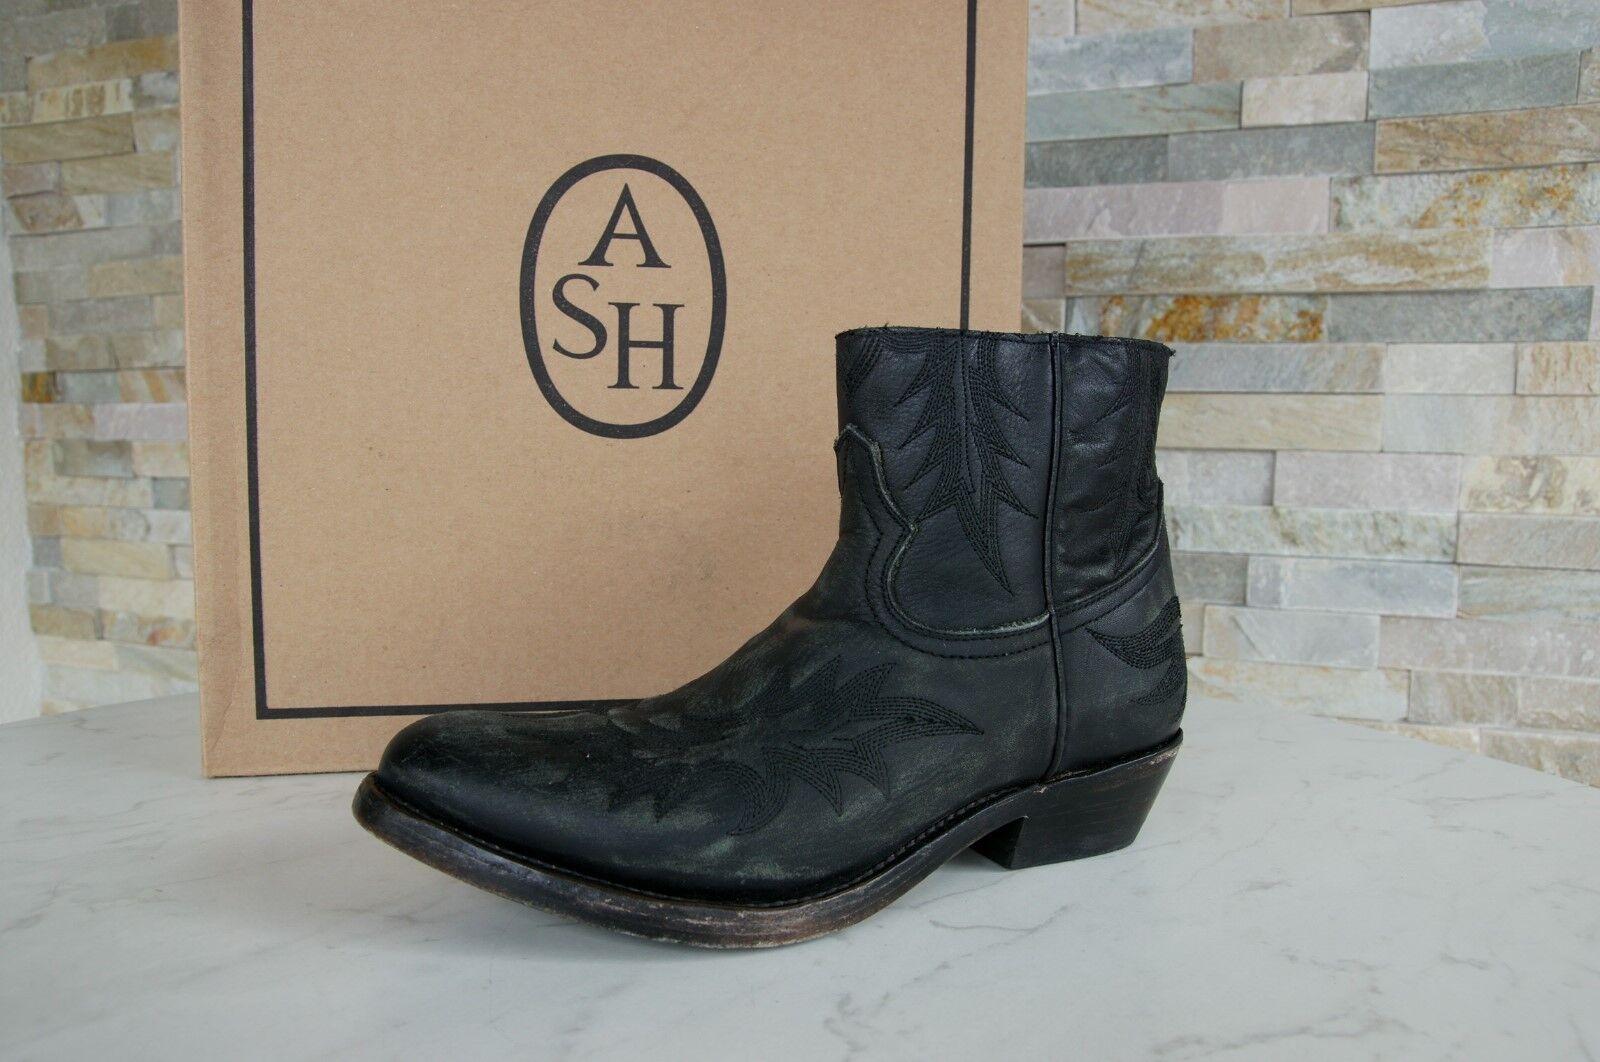 ASH 37 Stiefel Schuhe Stiefeletten Vintage Country Kurty schwarz neu ehem